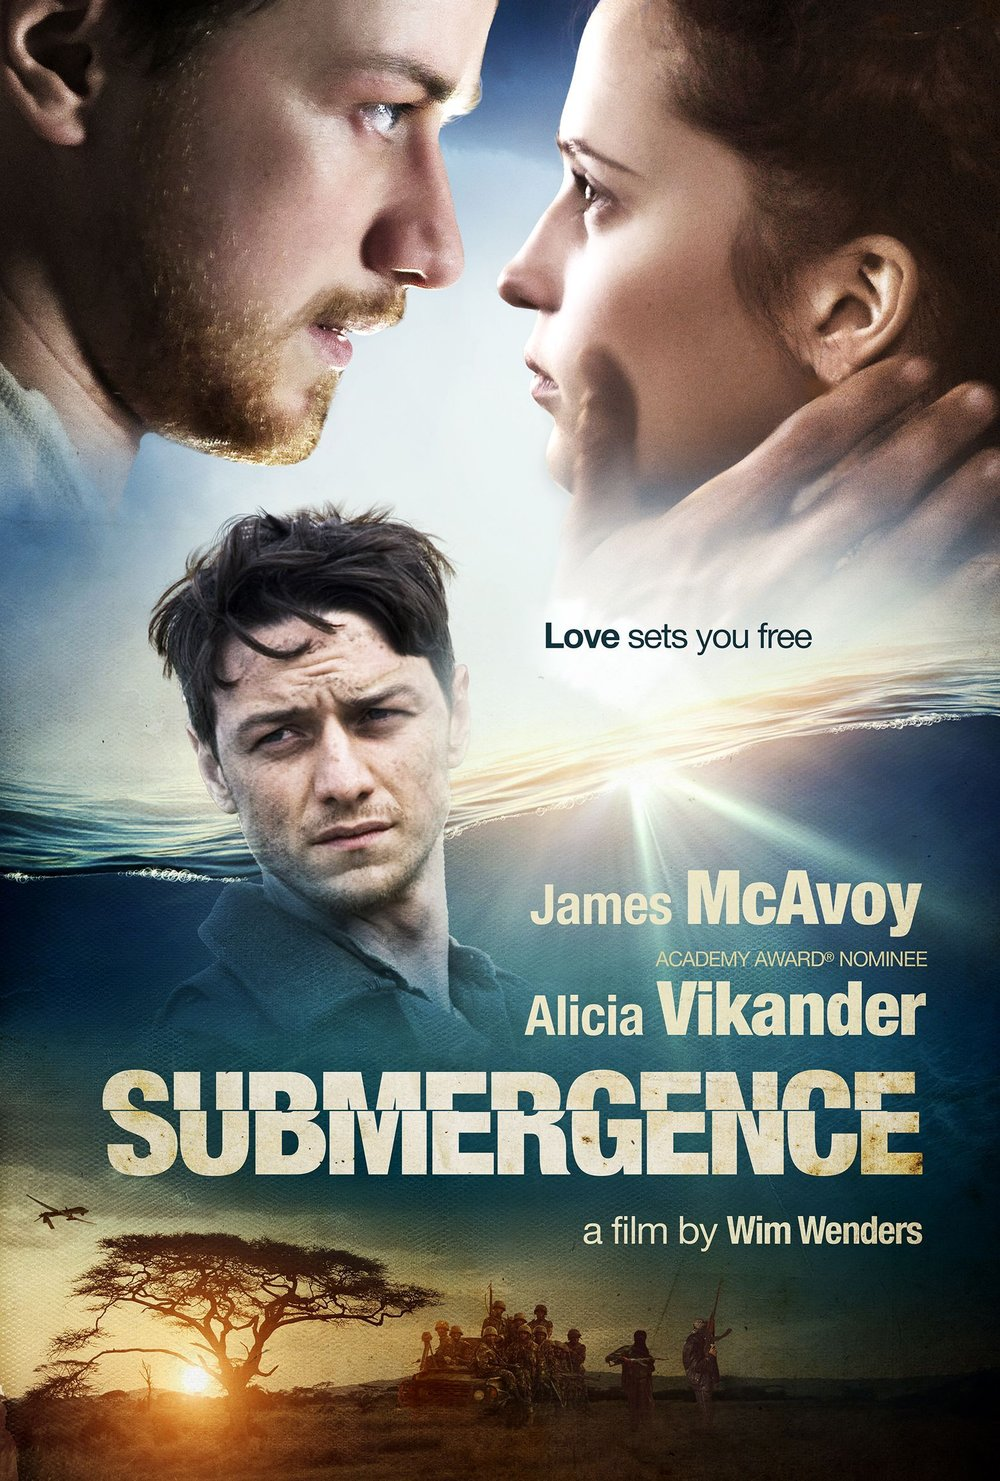 Submergence-movie-poster.jpg